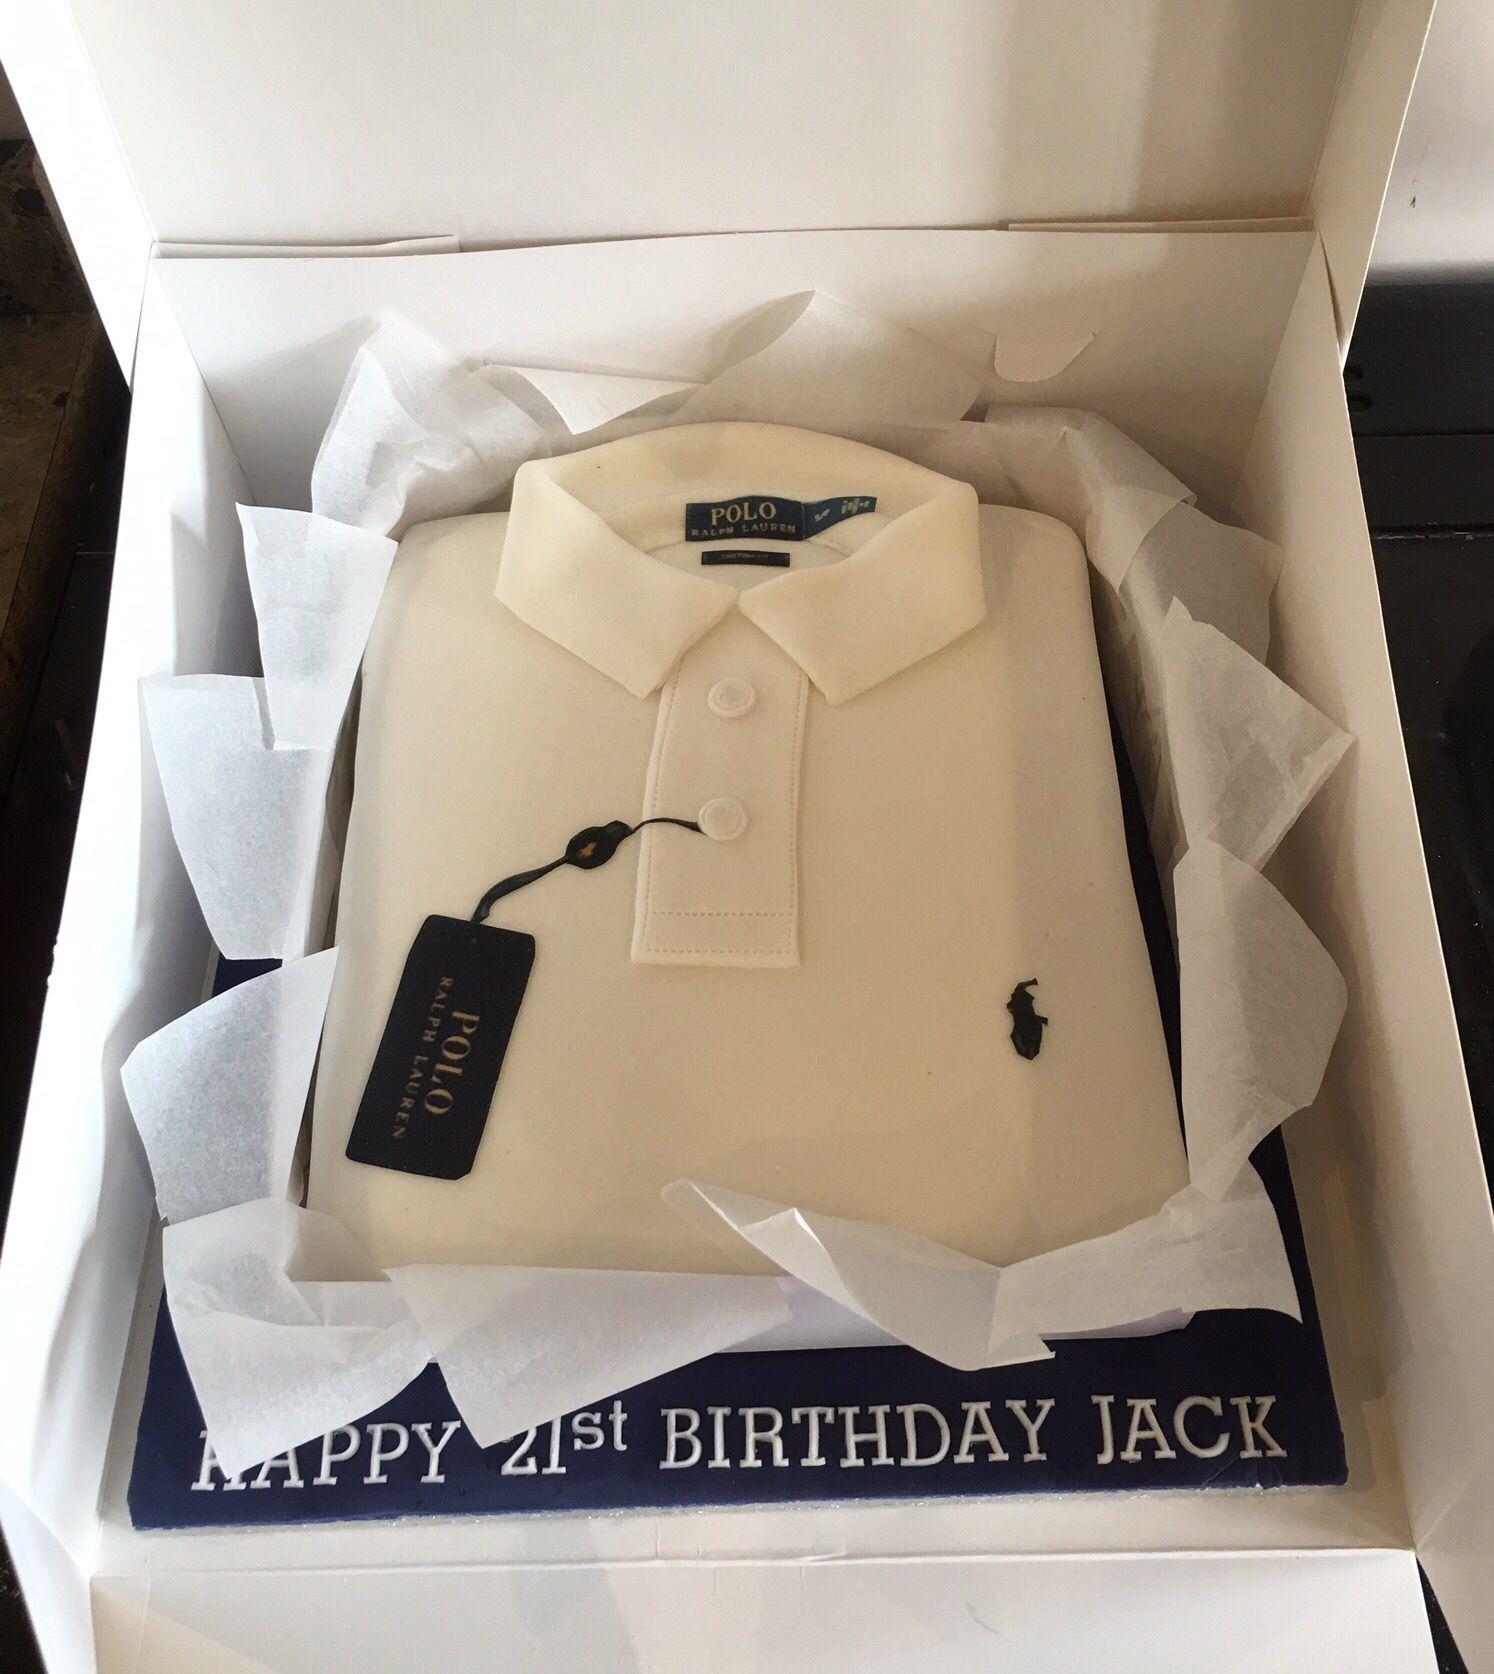 Ralph Lauren Polo Shirt Cake For A 21st Birthday